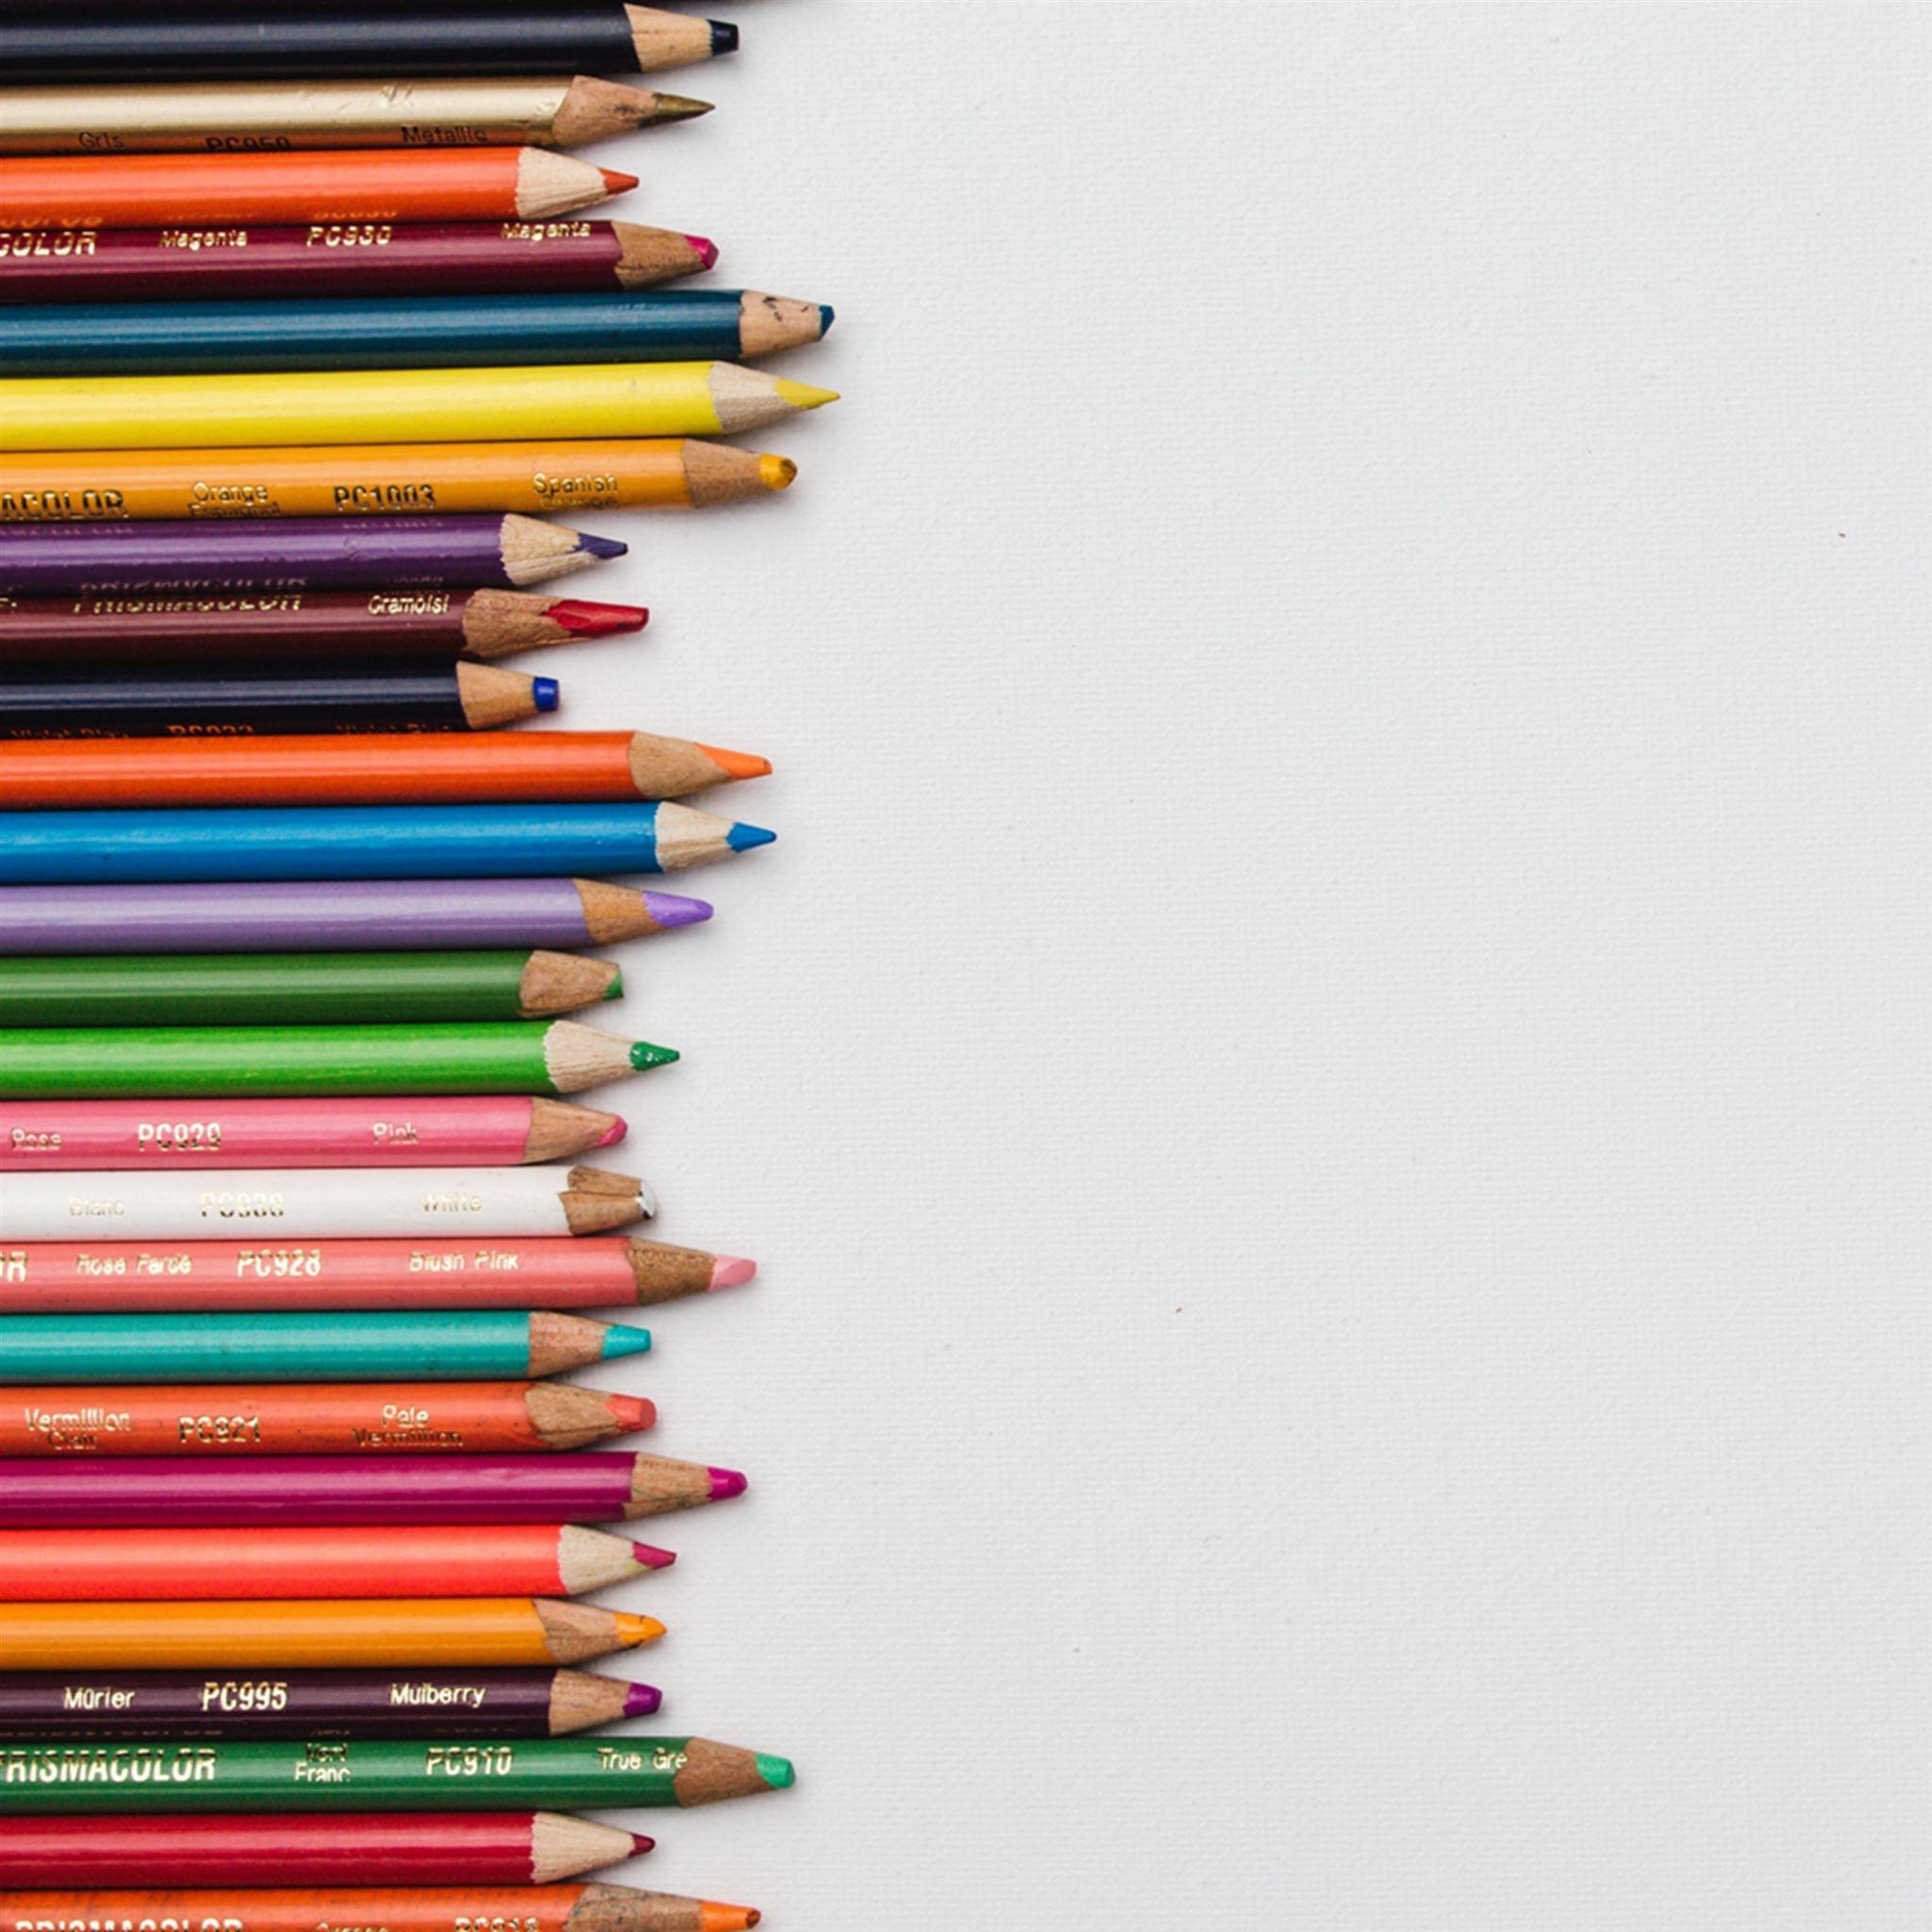 Colored Pencils Set Sharpened iPad Pro wallpaper